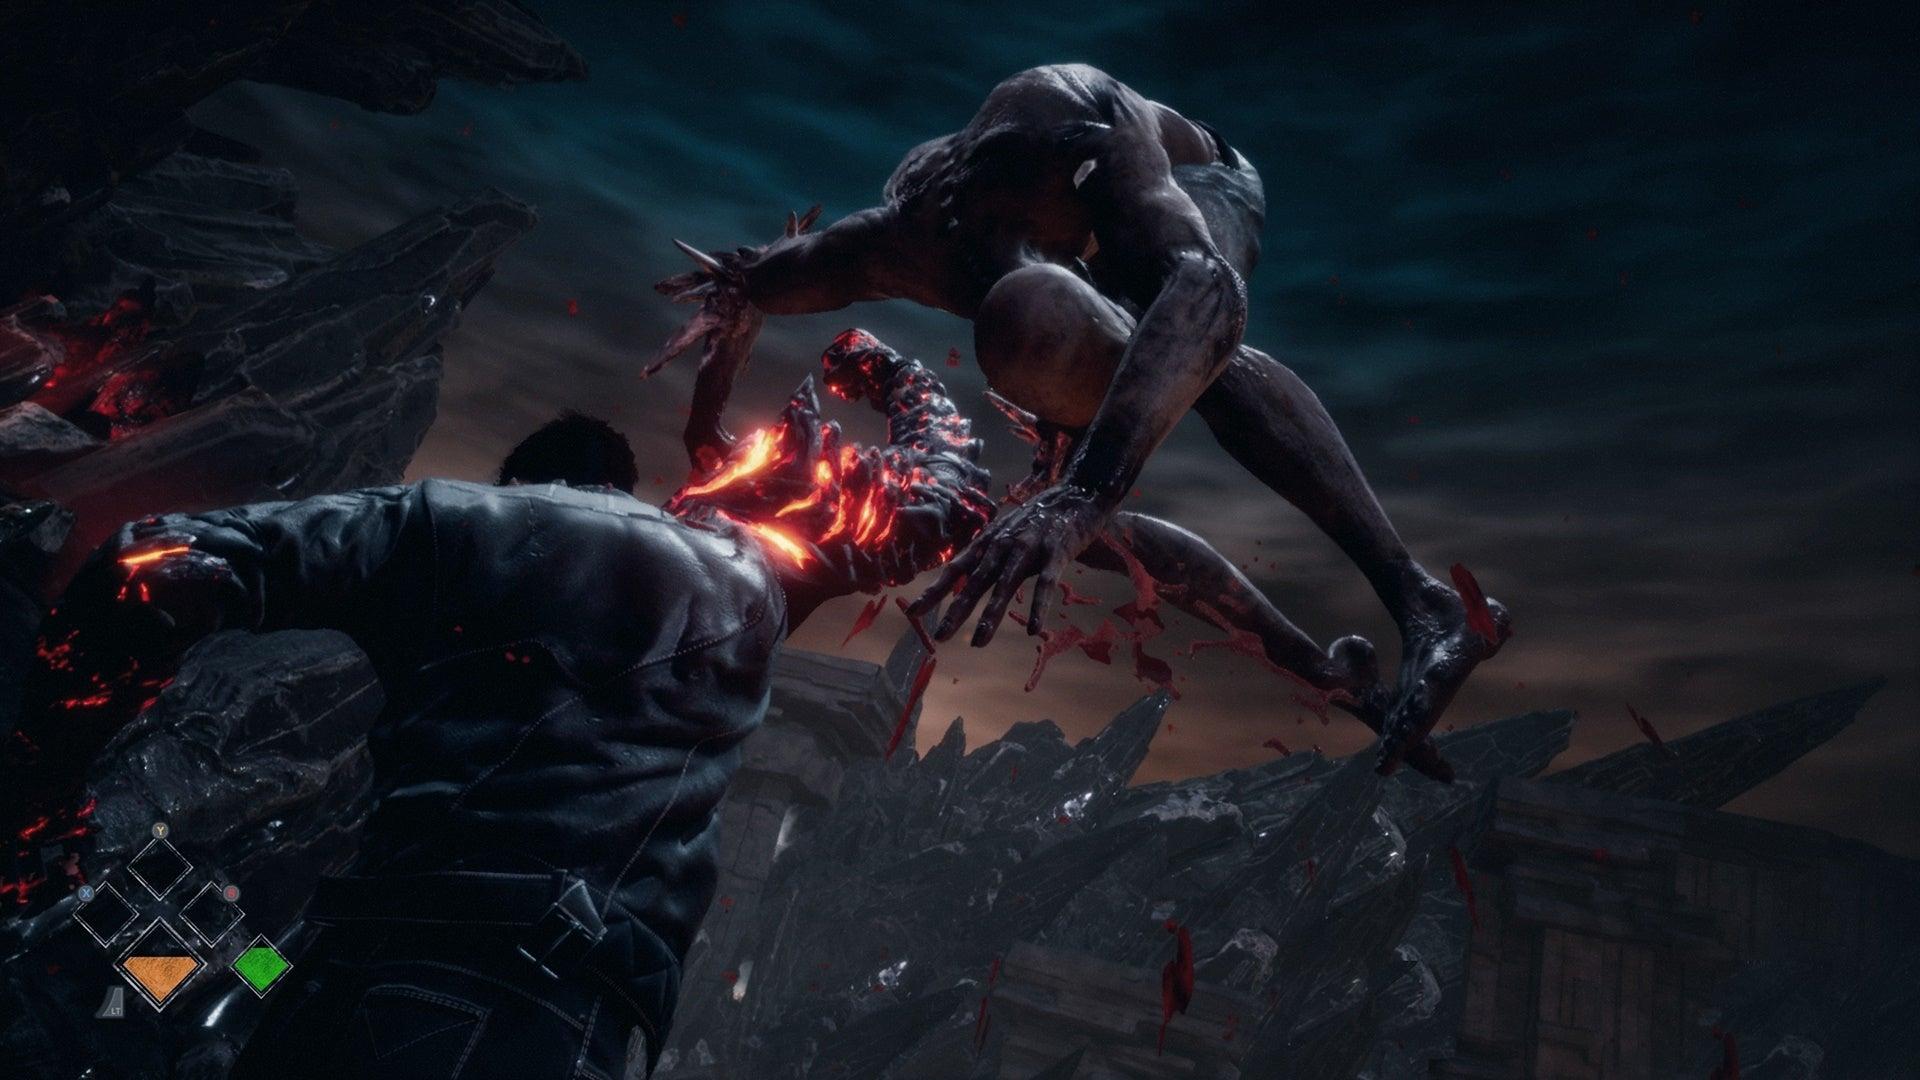 Image for Devil's Hunt lets you choose sides in a war between angels and demons